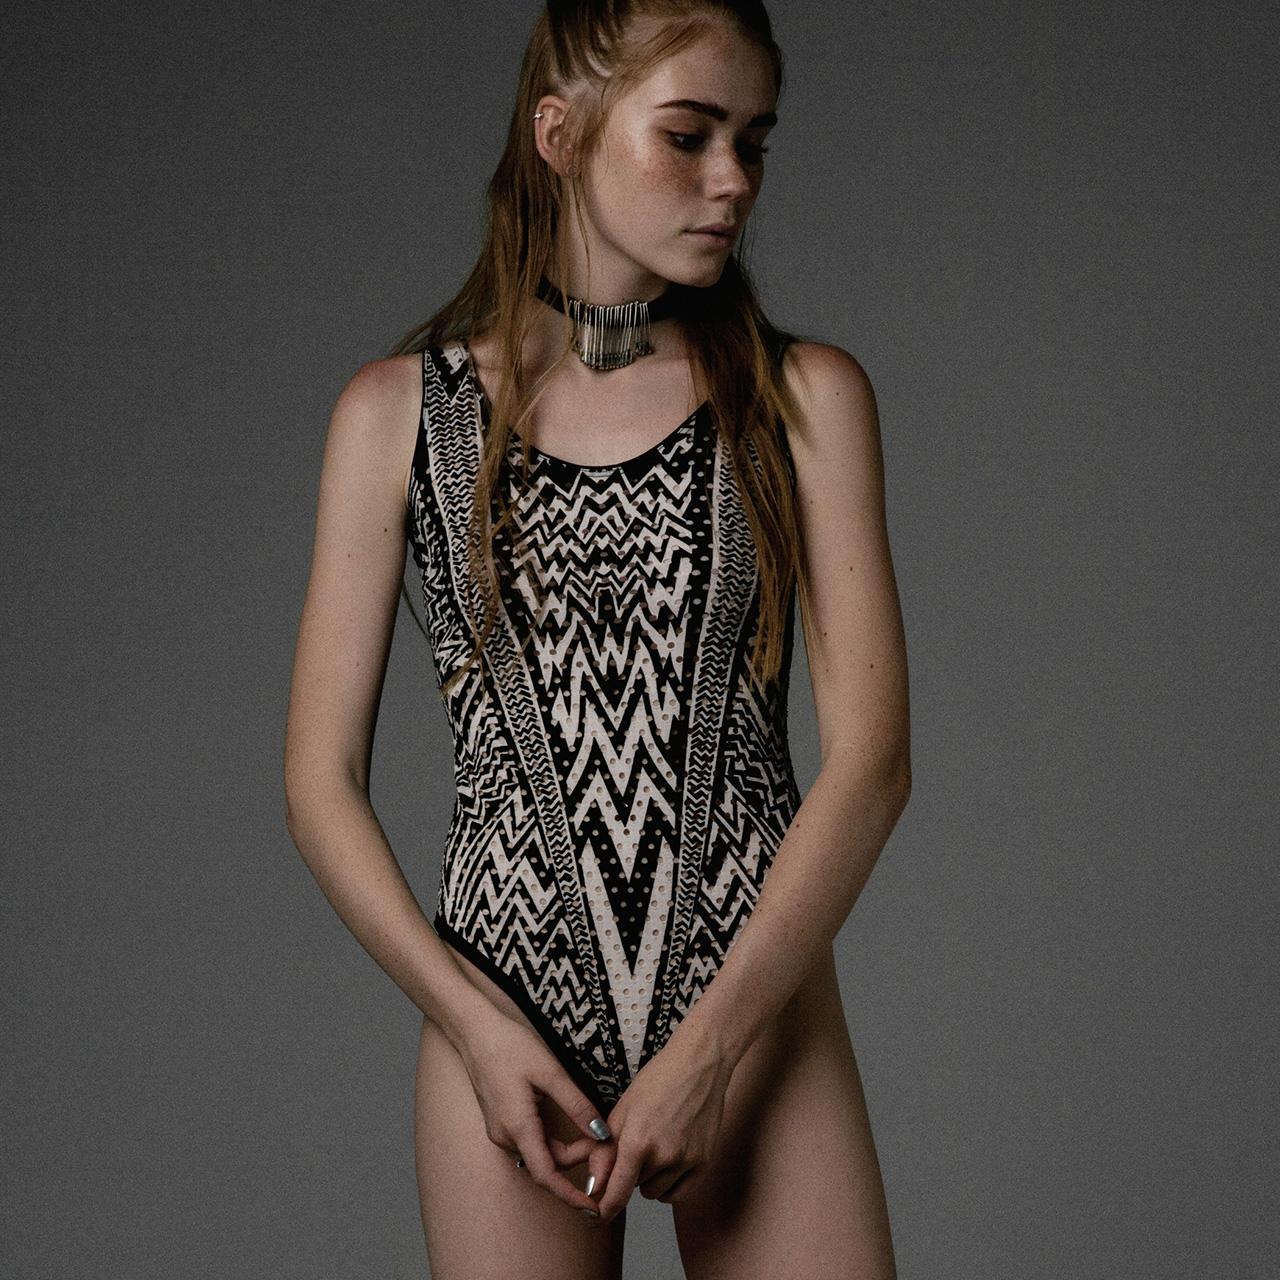 Maria Patelis Fashion Designer.